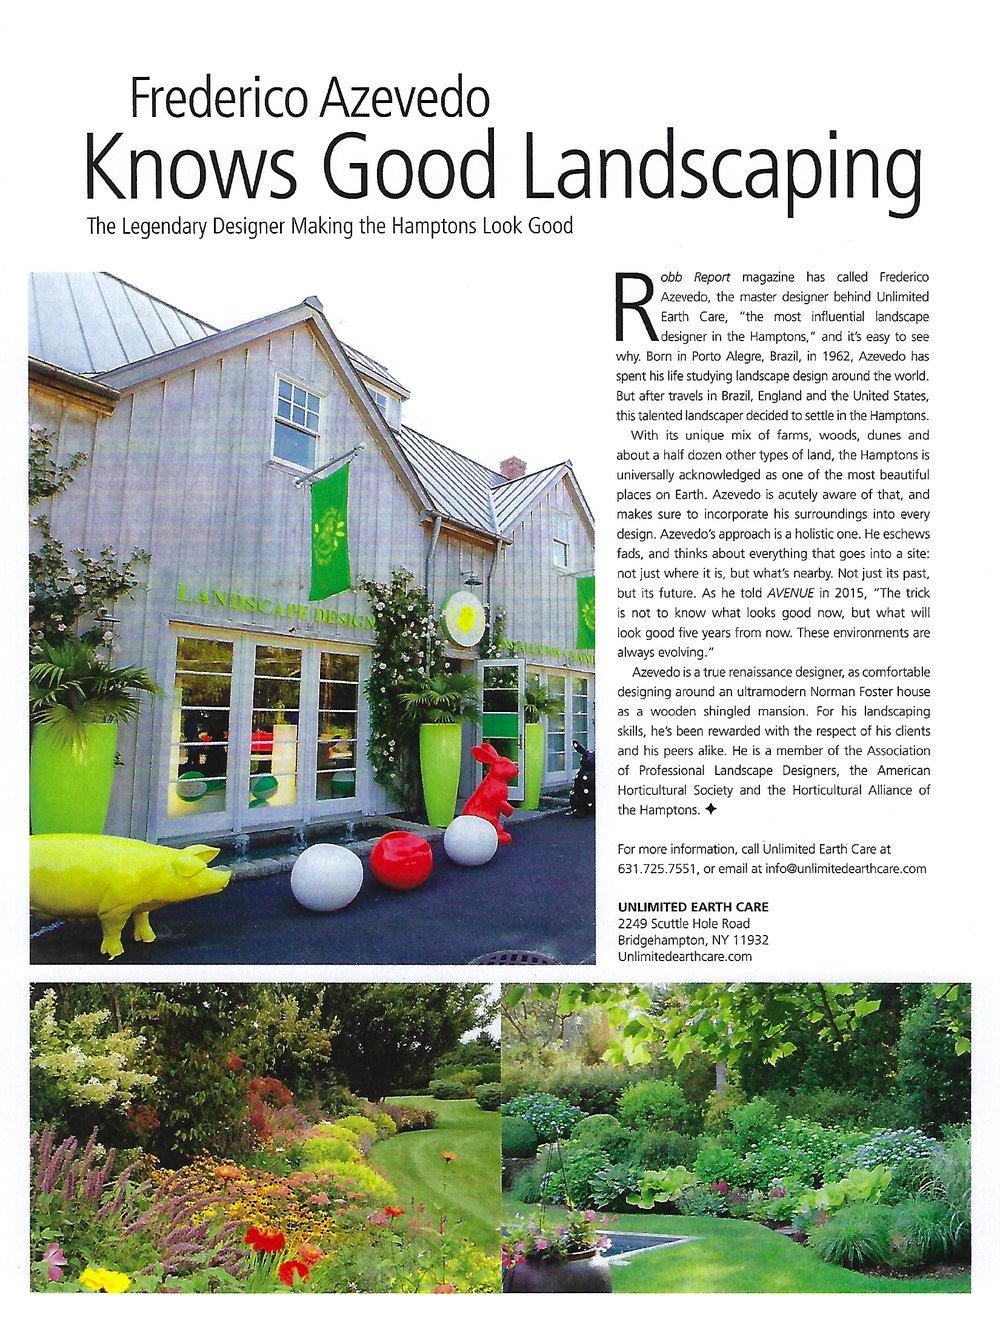 Avenue Magazine - FA Knows Good Landscaping_June 2017 1.jpg